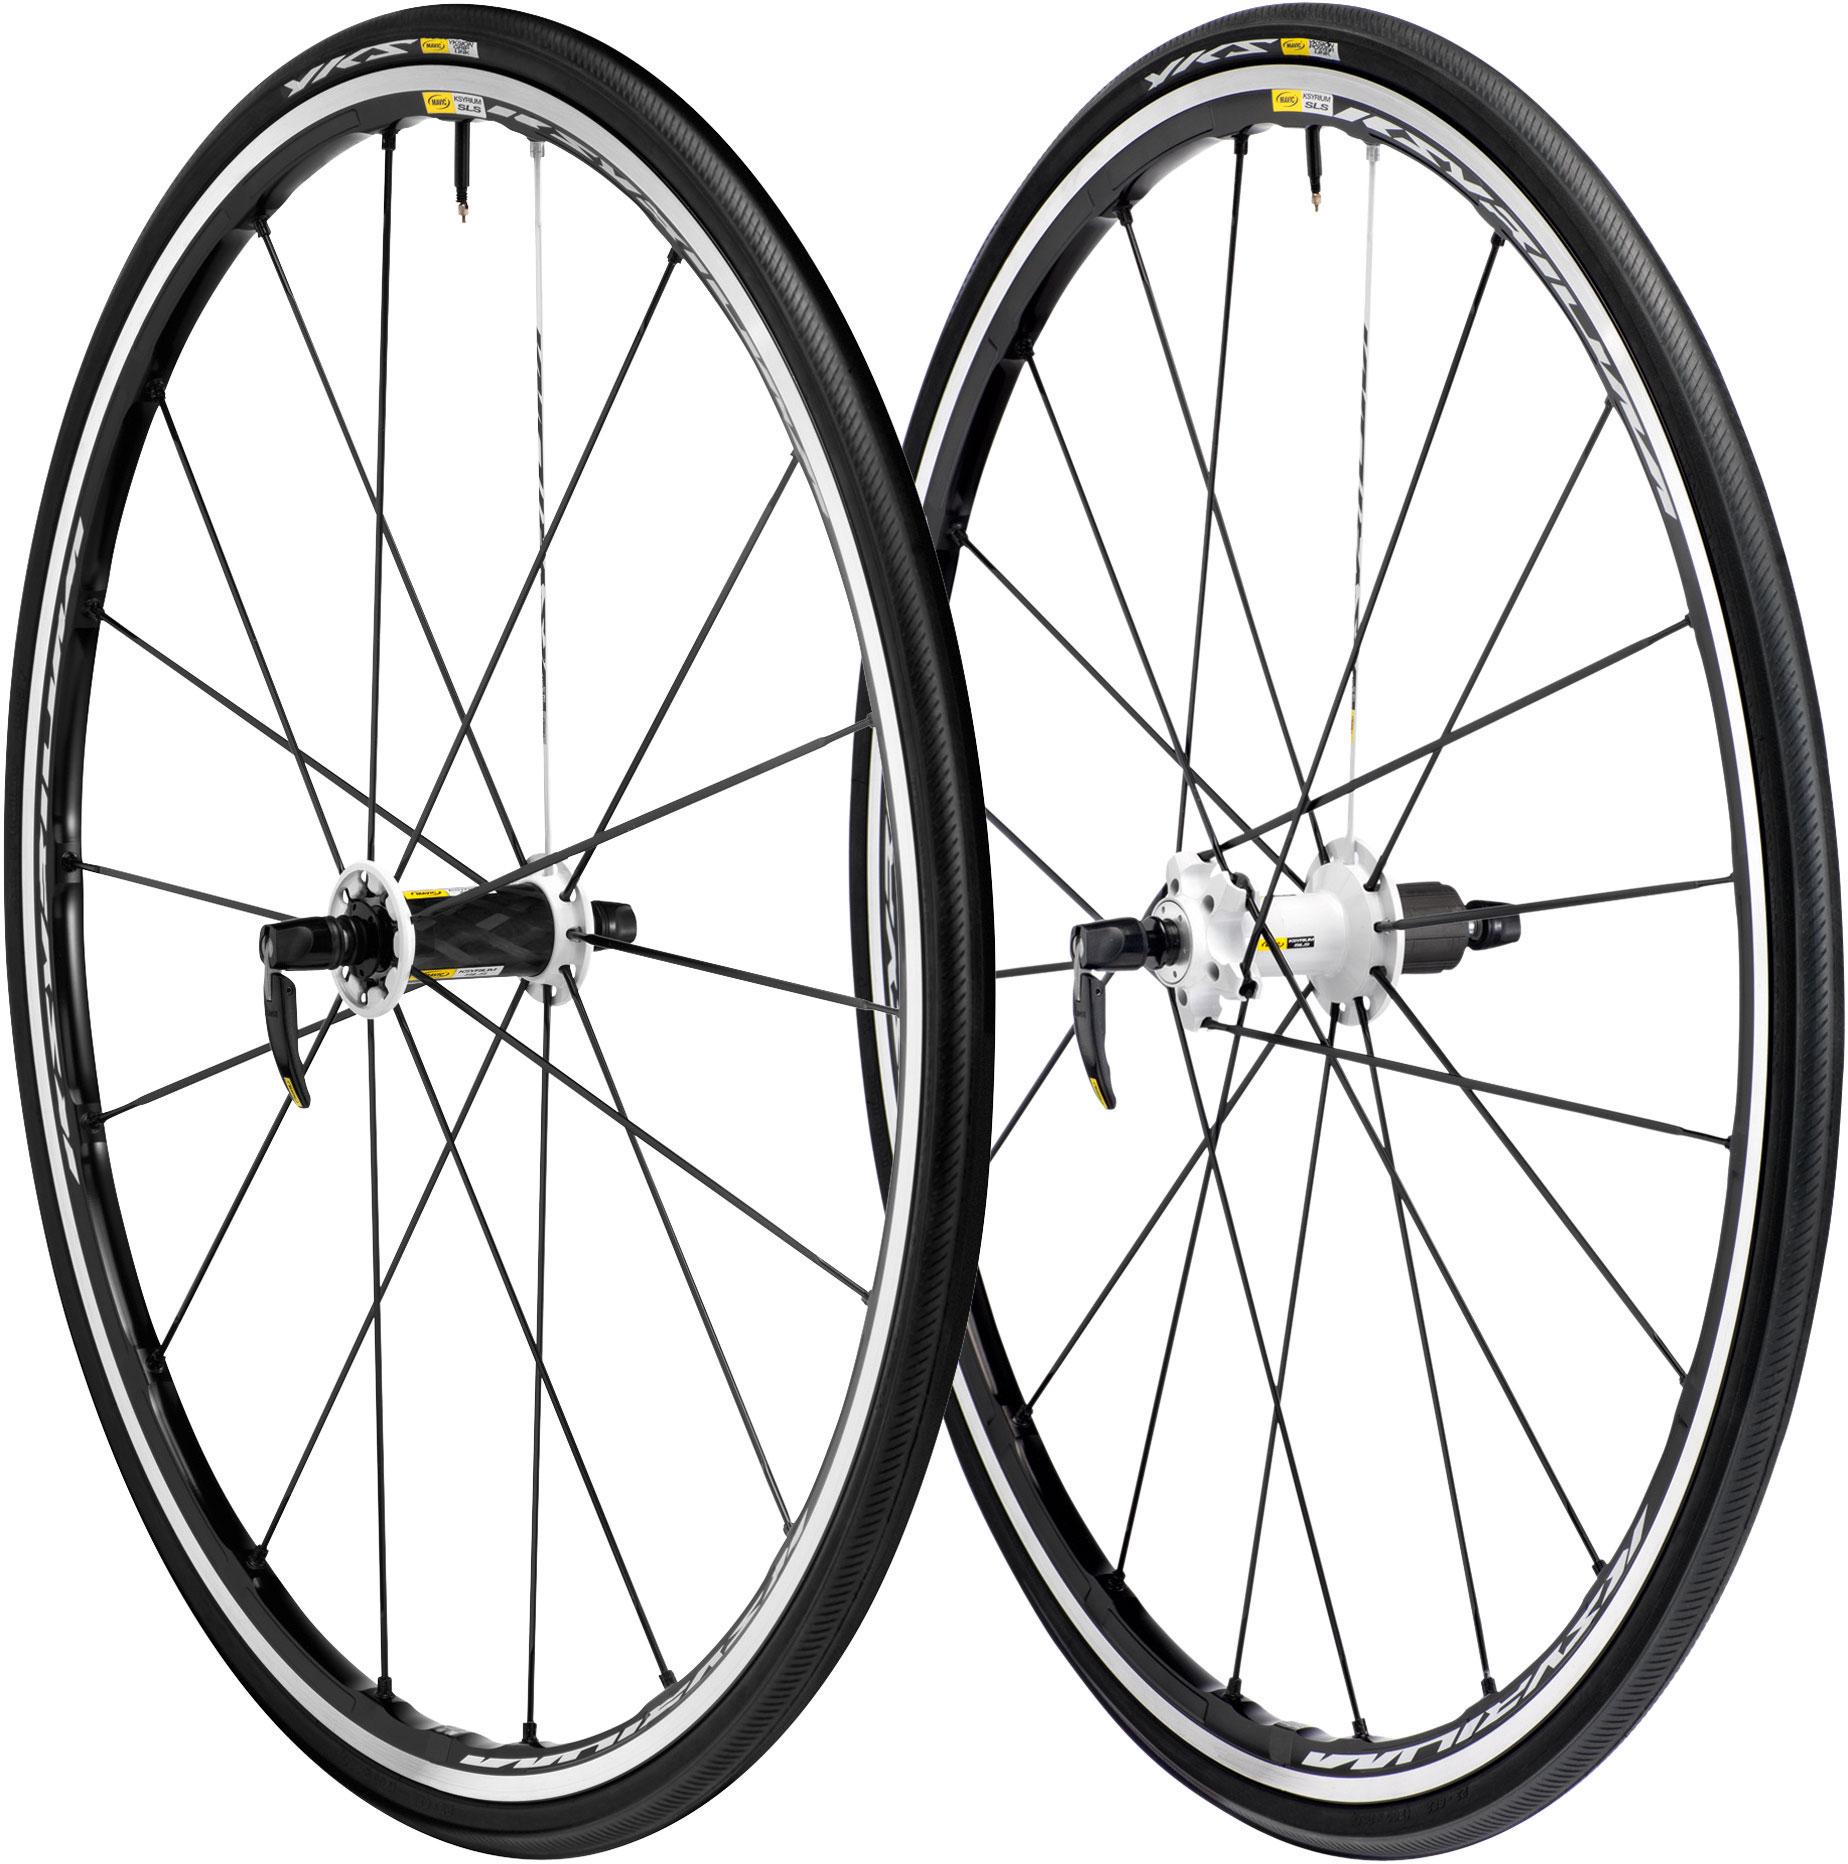 a445dc87f87 Mavic Ksyrium SLS Wheel/Tire Set - City Bikes